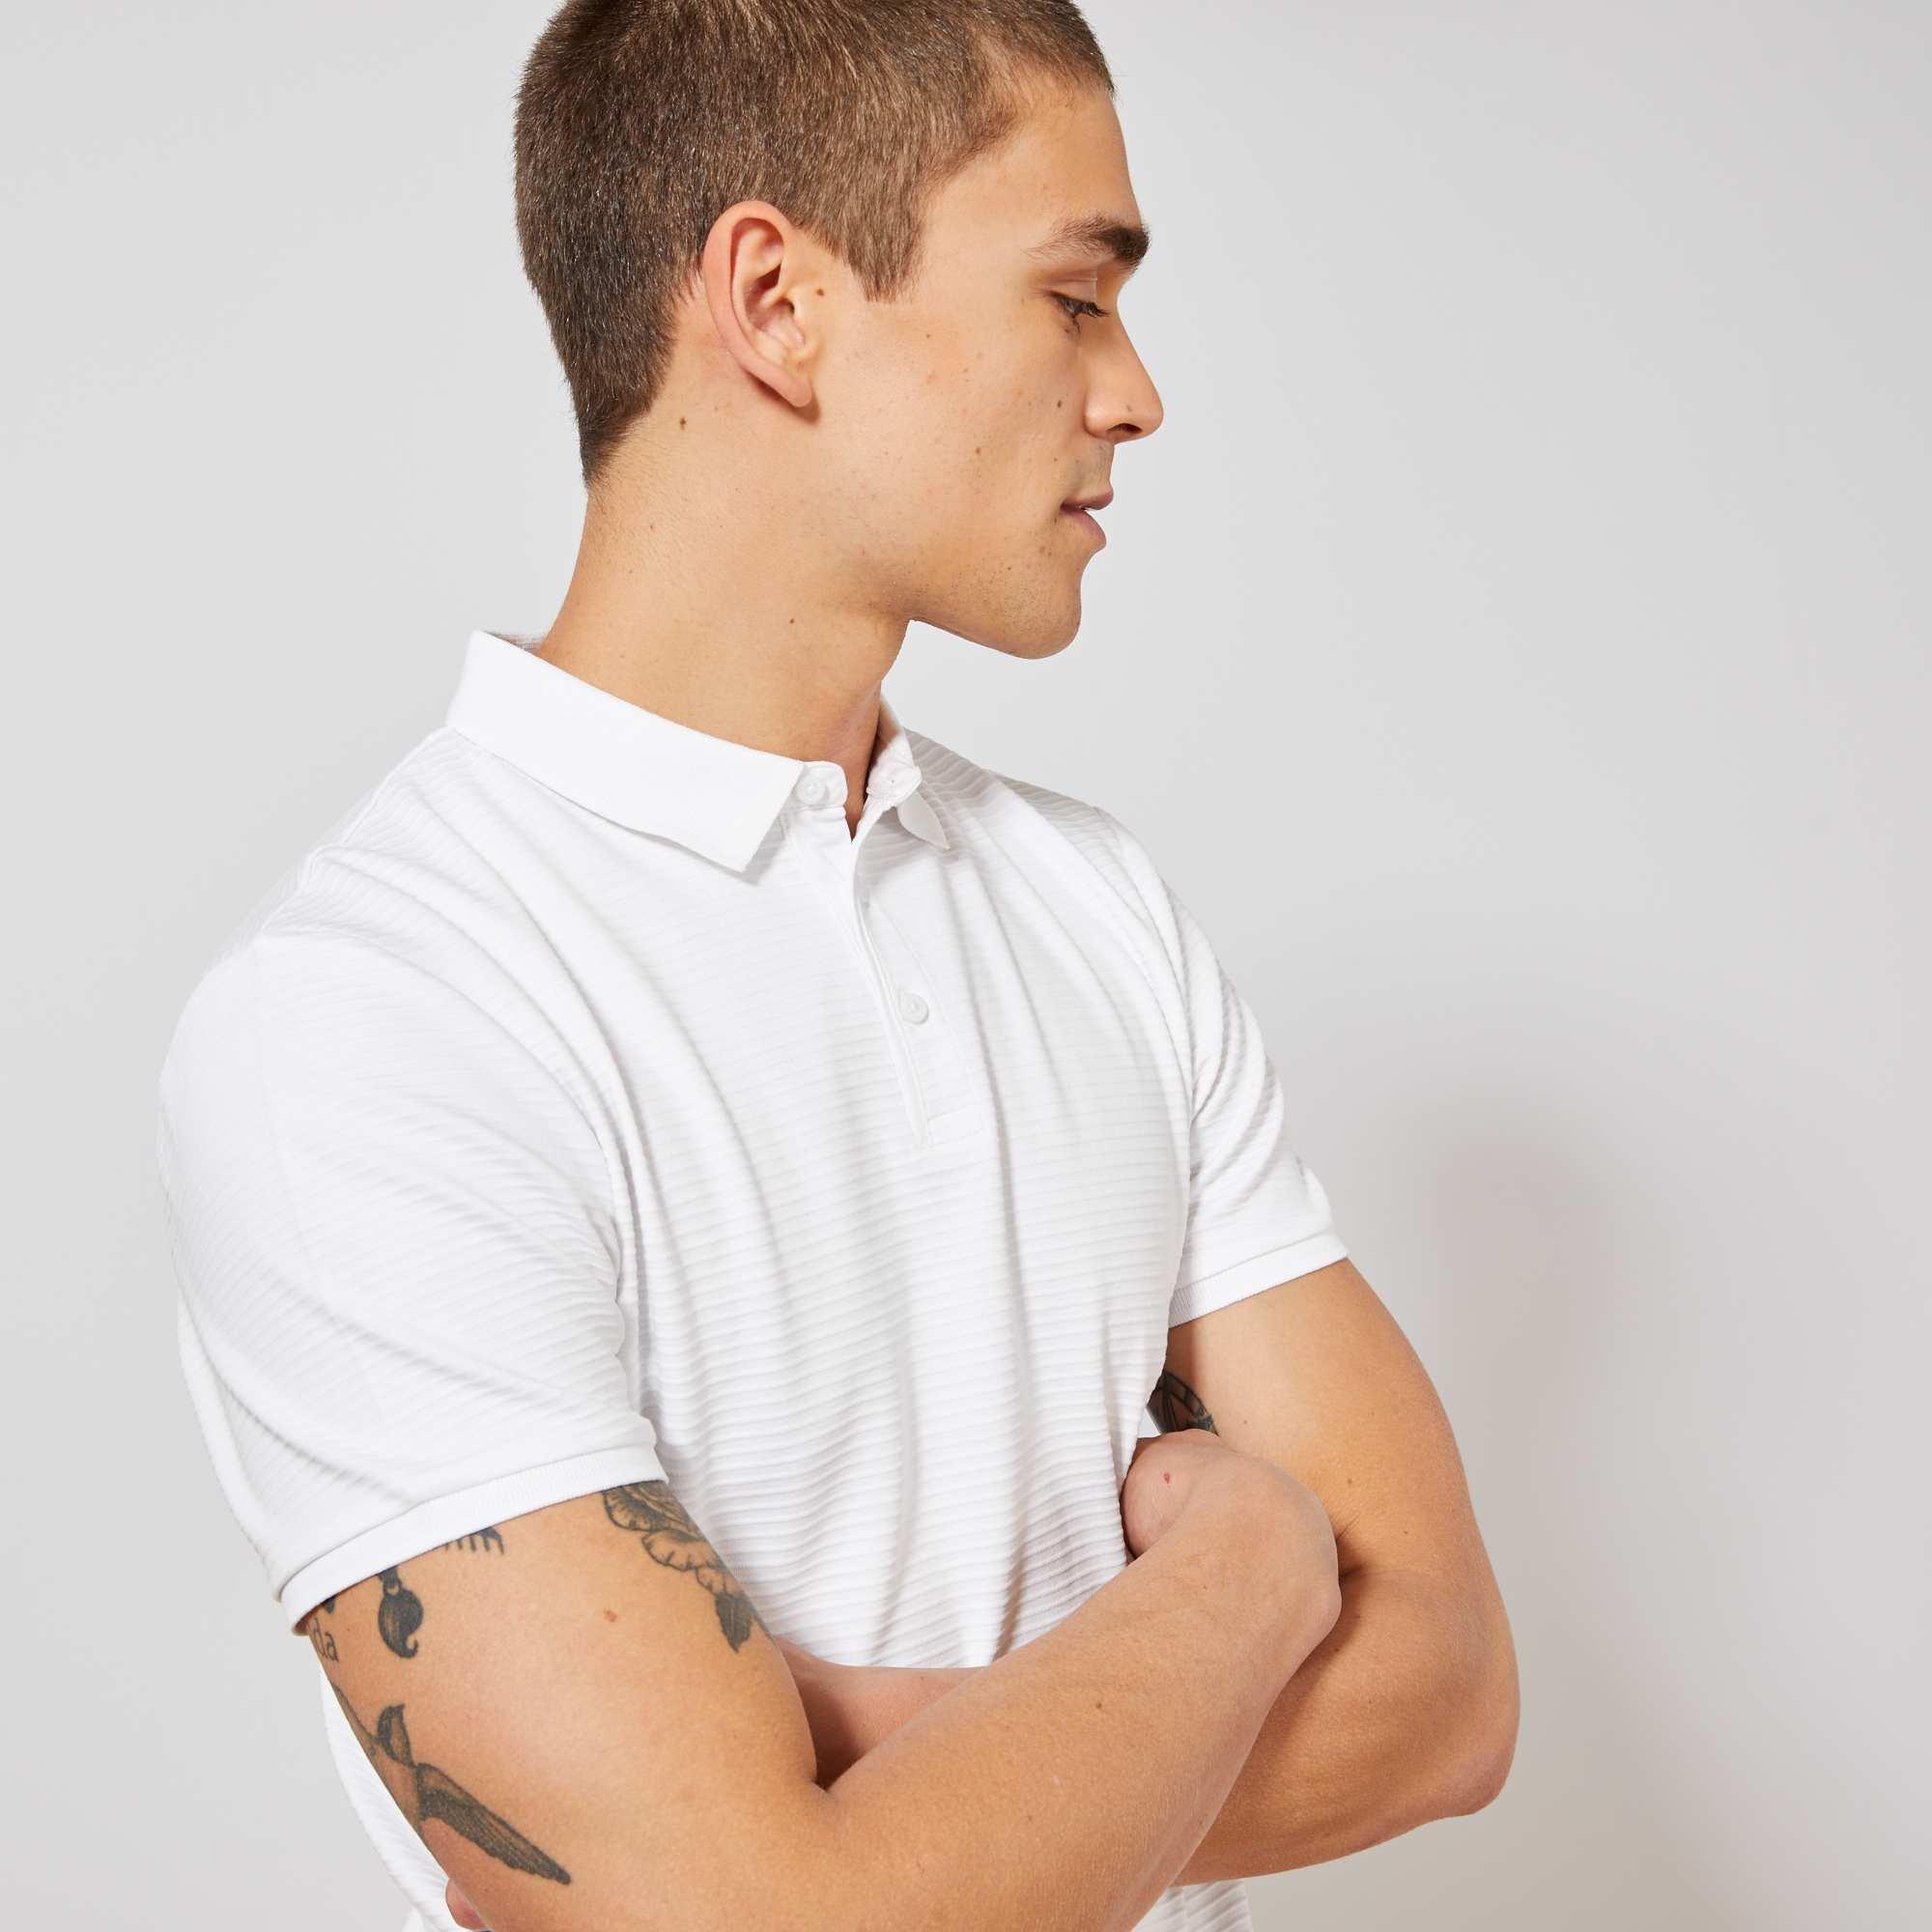 f112a5ba11dc4 Polo slim rayures relief Homme - blanc - Kiabi - 10